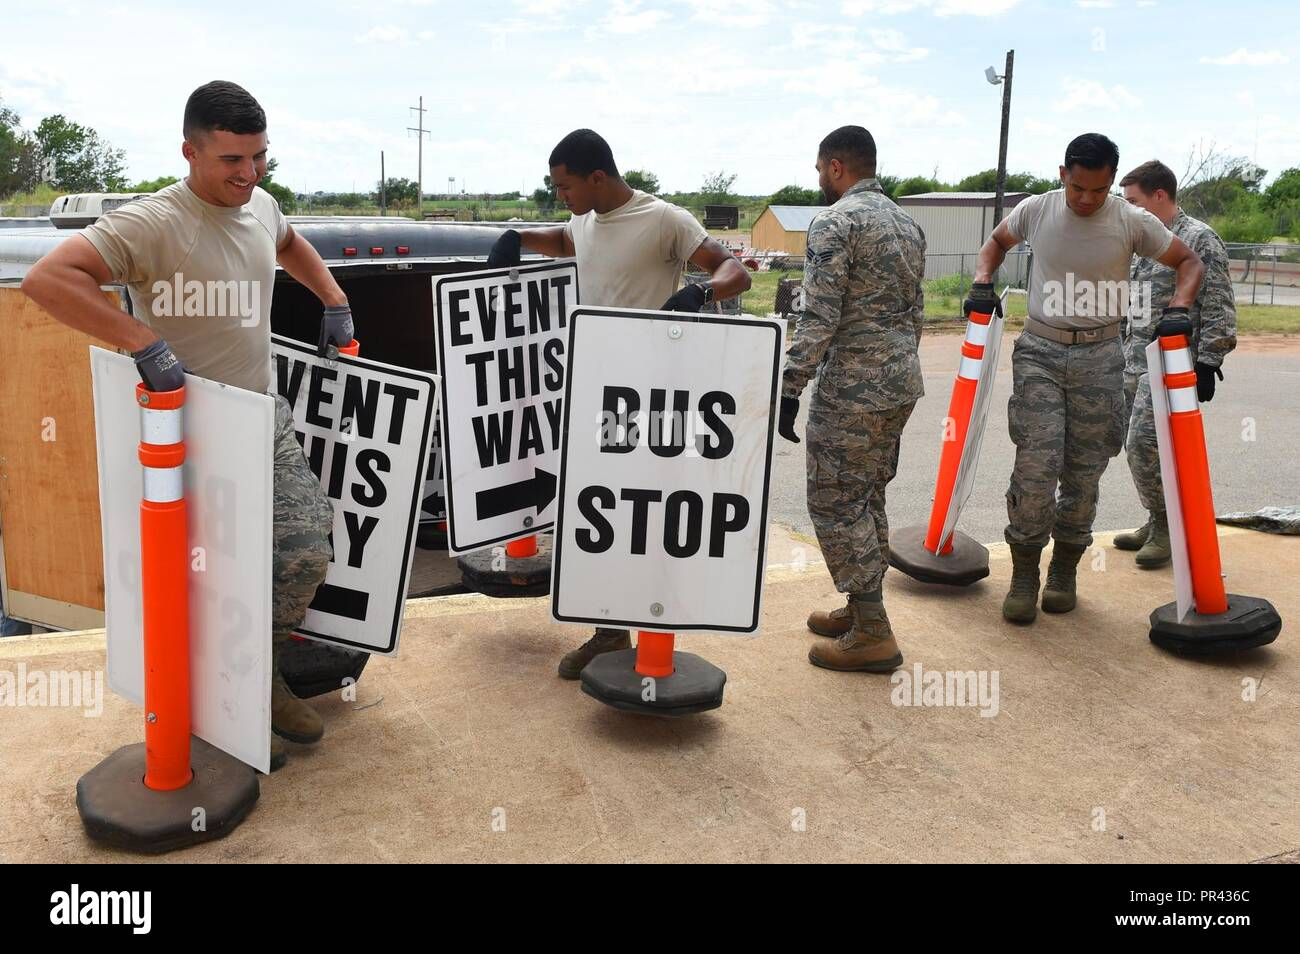 97th Civil Engineer Squadron Stock Photos & 97th Civil Engineer